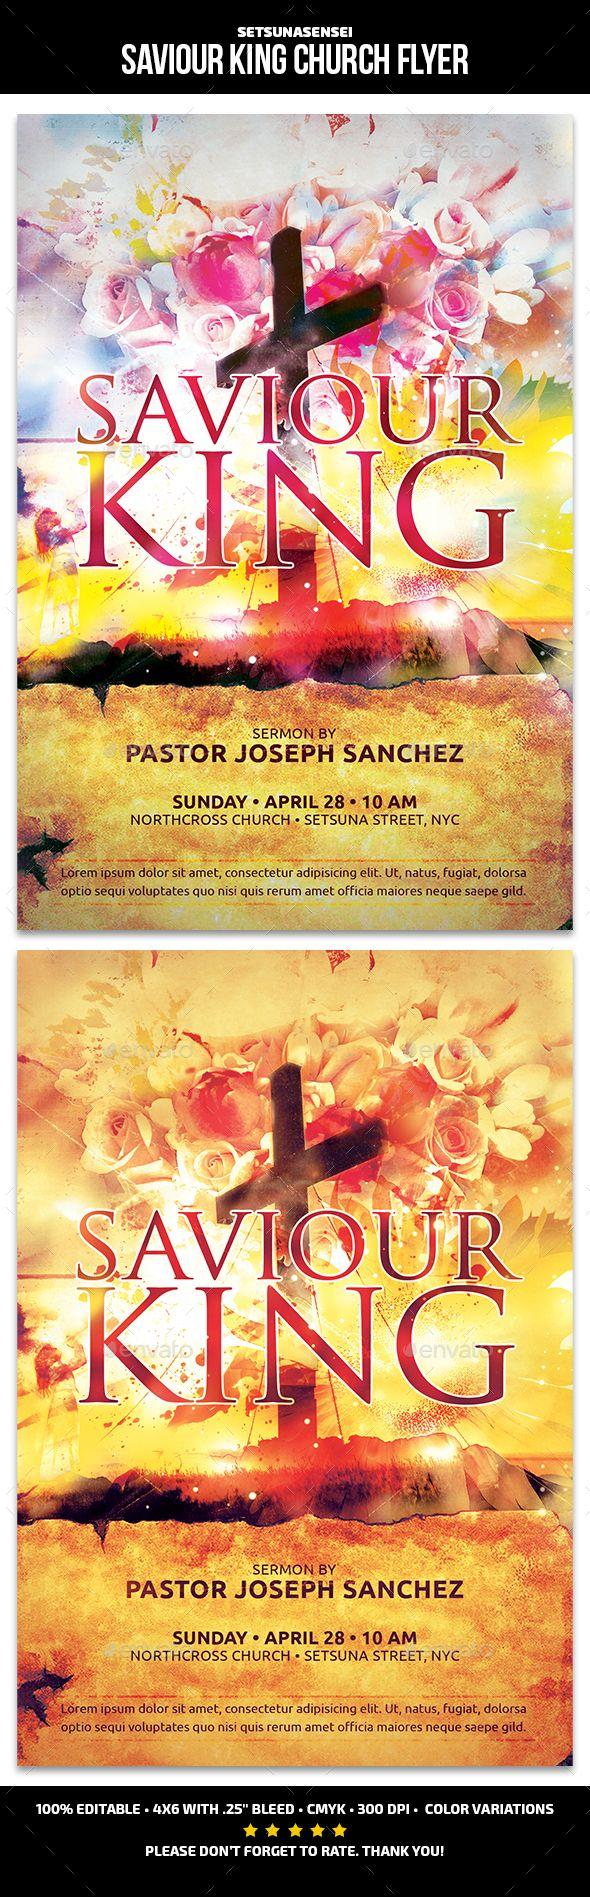 98 best Church/Gospel Templates images on Pinterest | Font logo ...